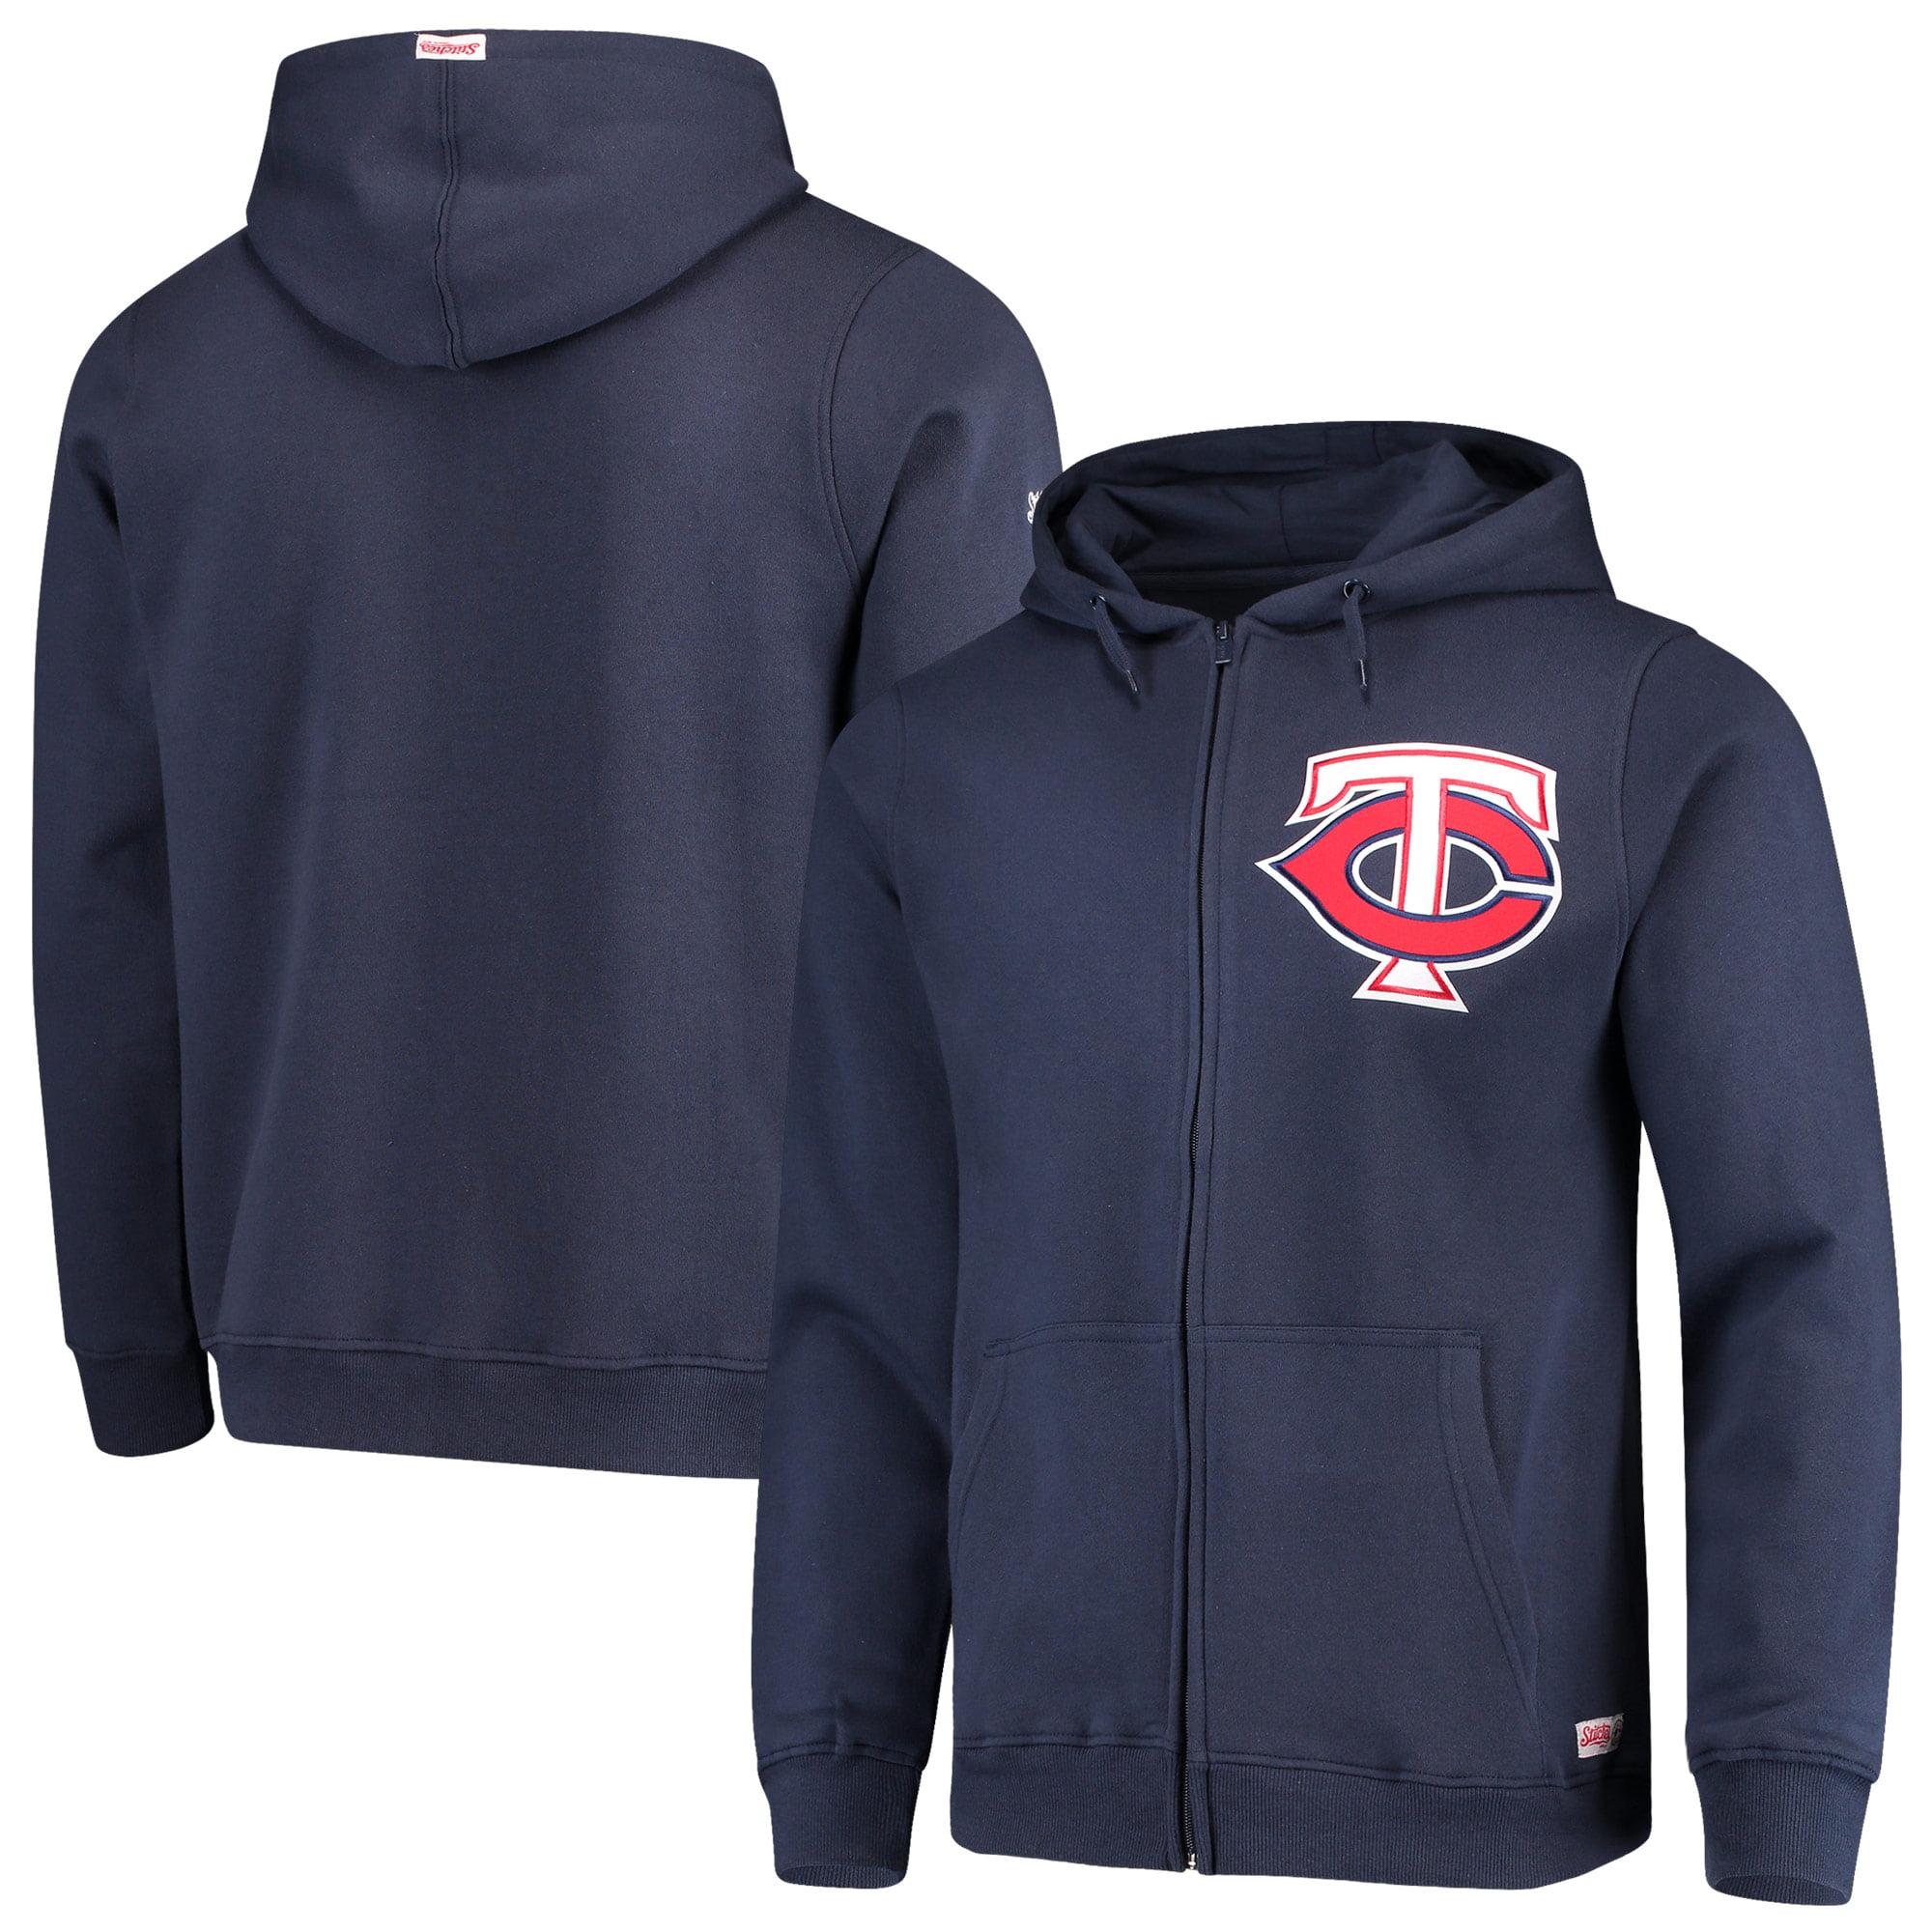 Minnesota Twins Stitches Fleece Full-Zip Hoodie - Navy